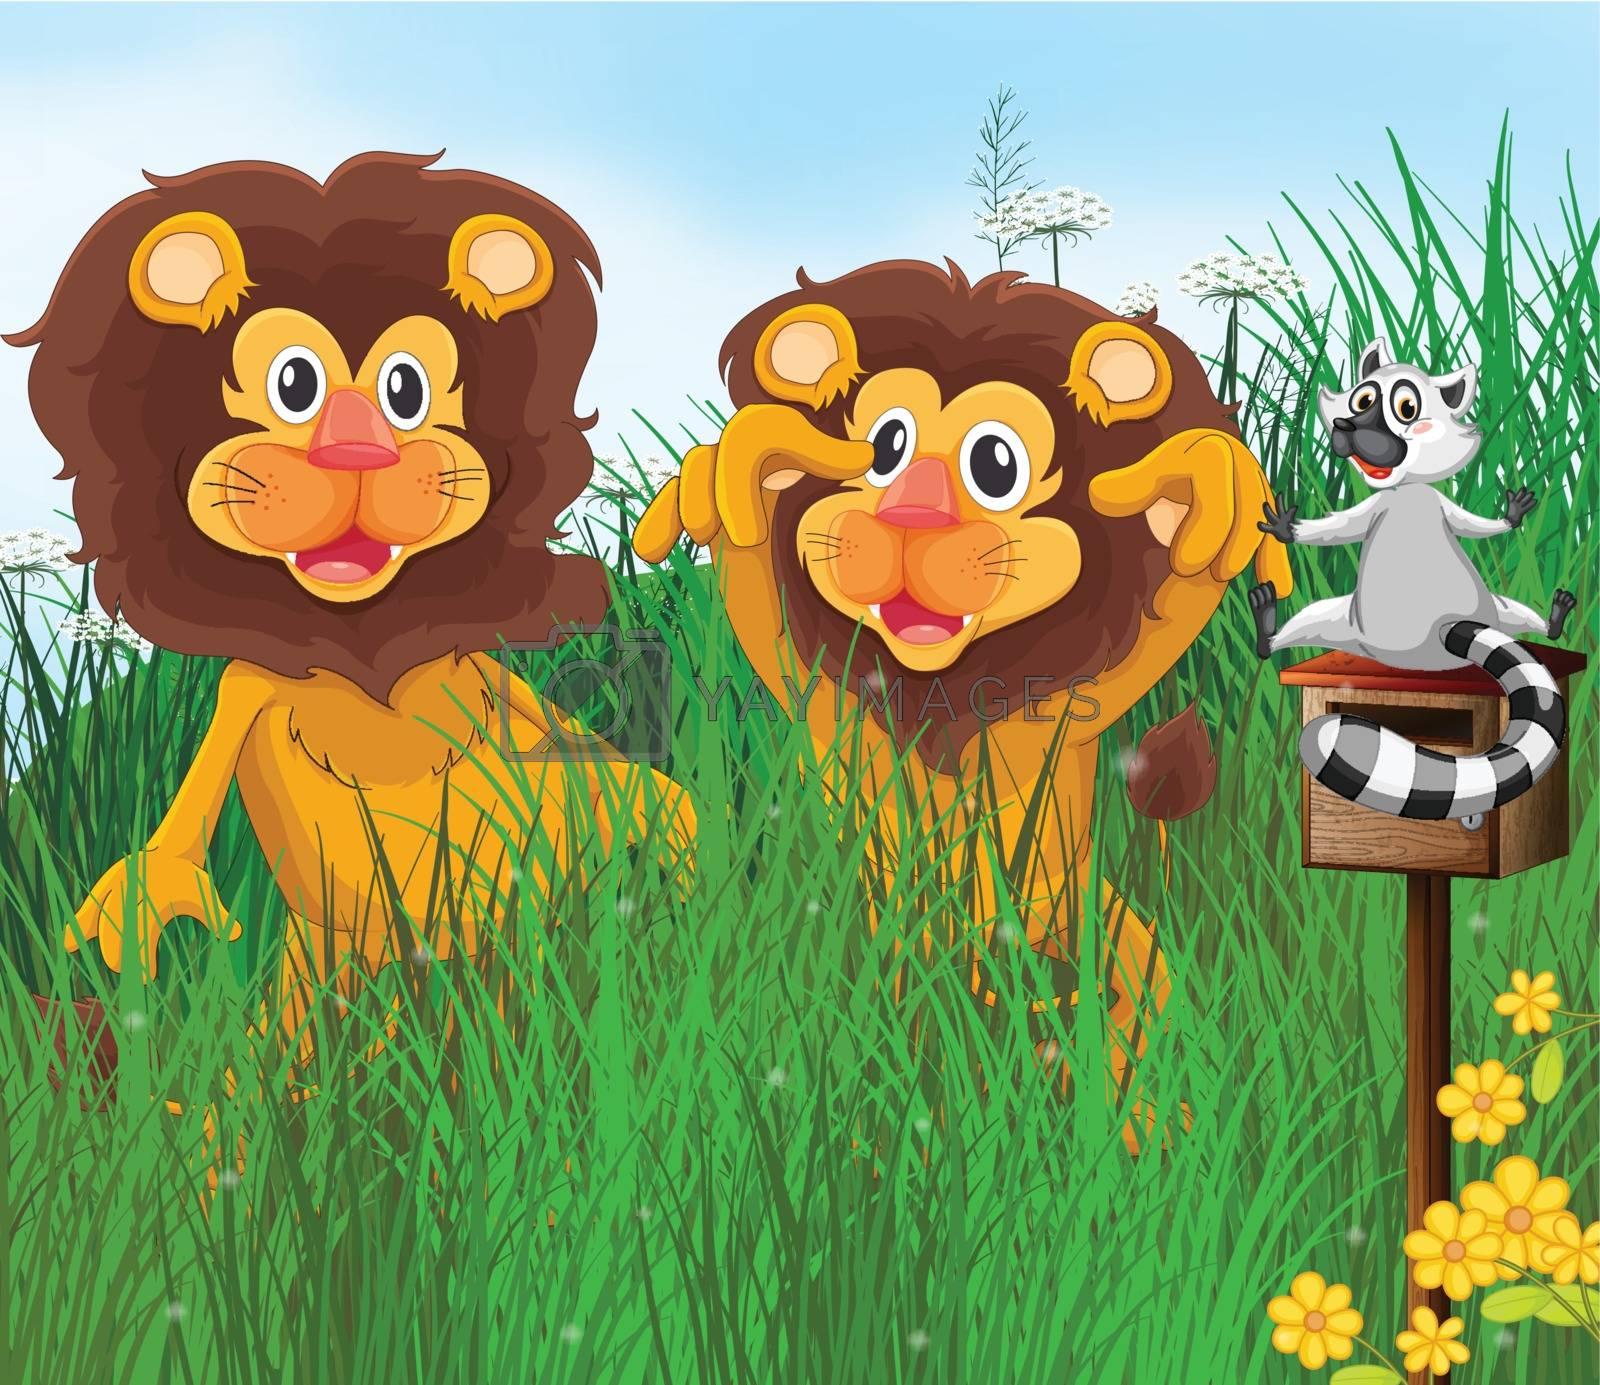 Illustration of three animals in the grass